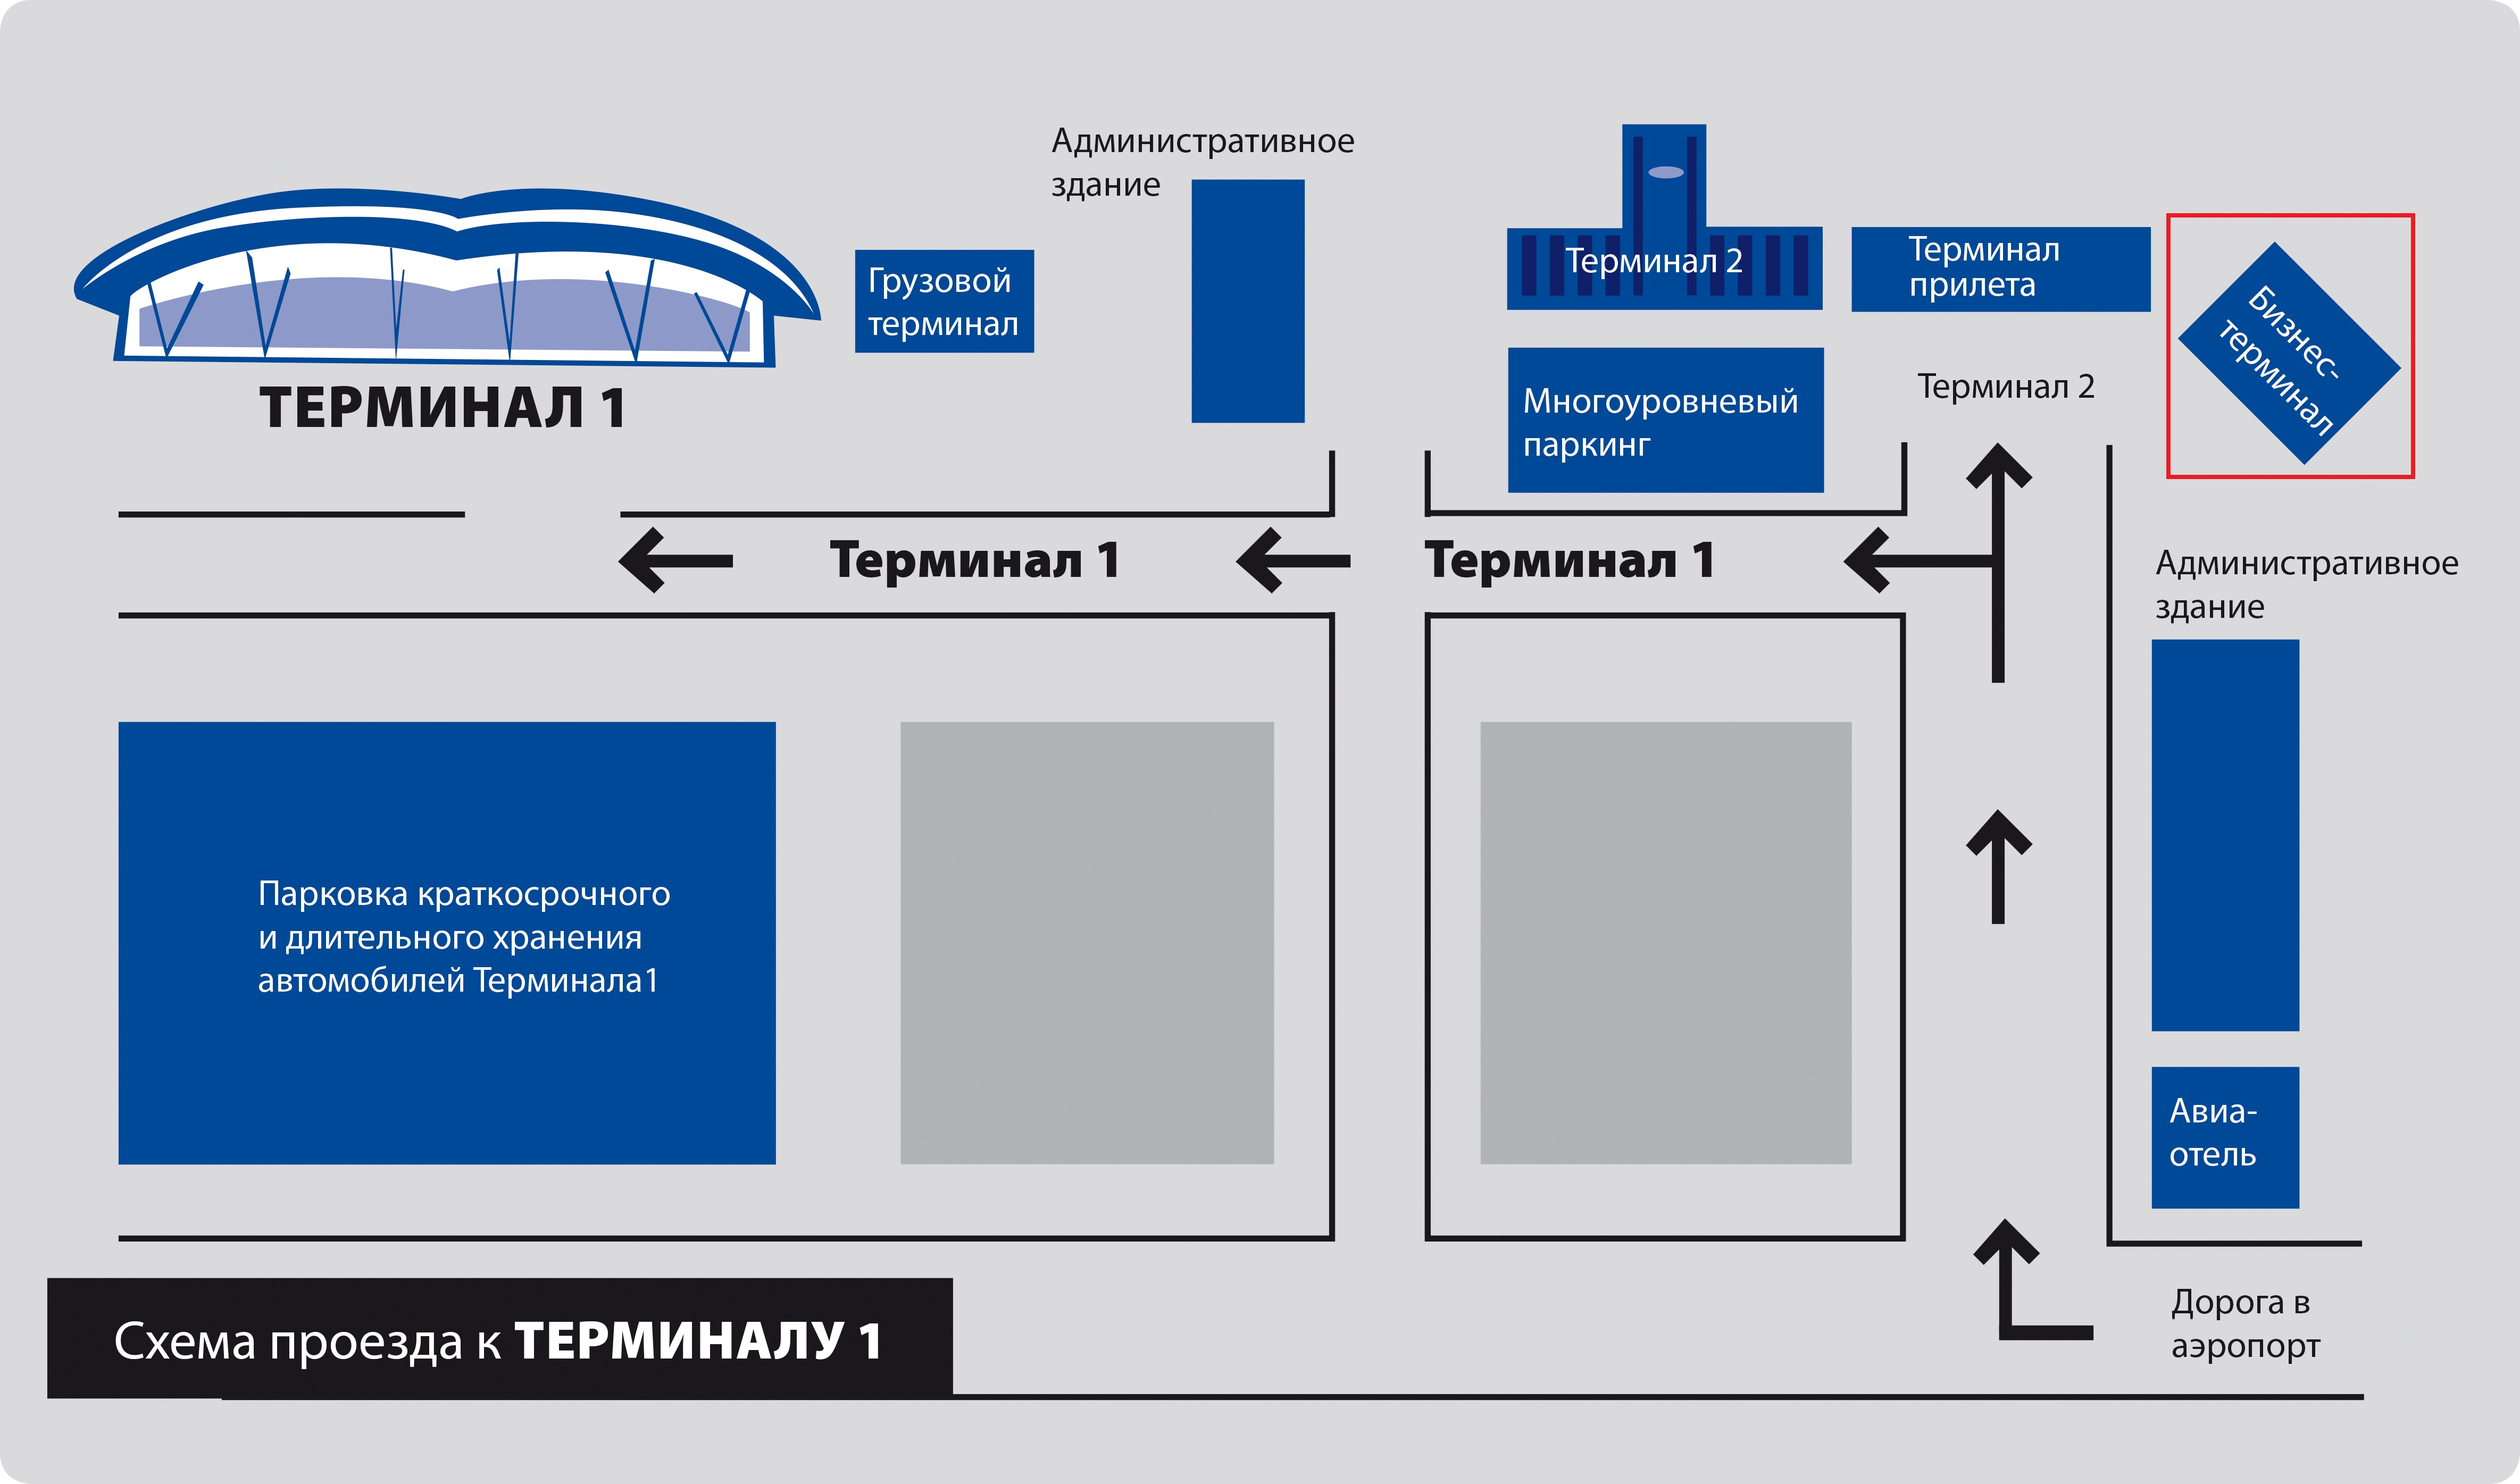 Аэропорт внуково терминал а схема проезда 122